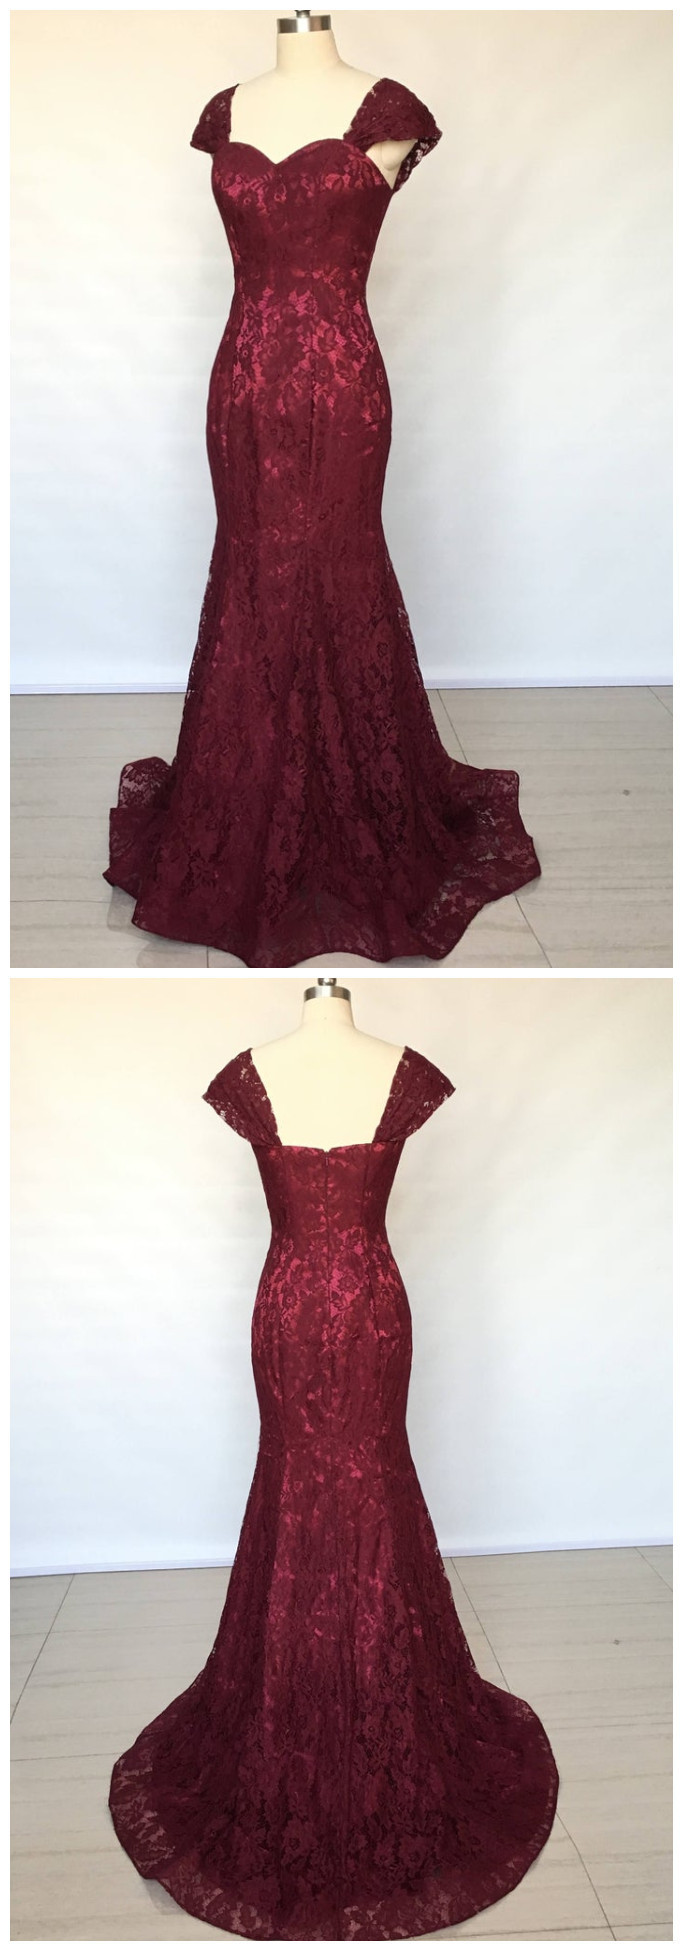 Beautiful Mermaid Sweetheart Burgundy Lace Long Bridesmaid Dress, Lace Prom